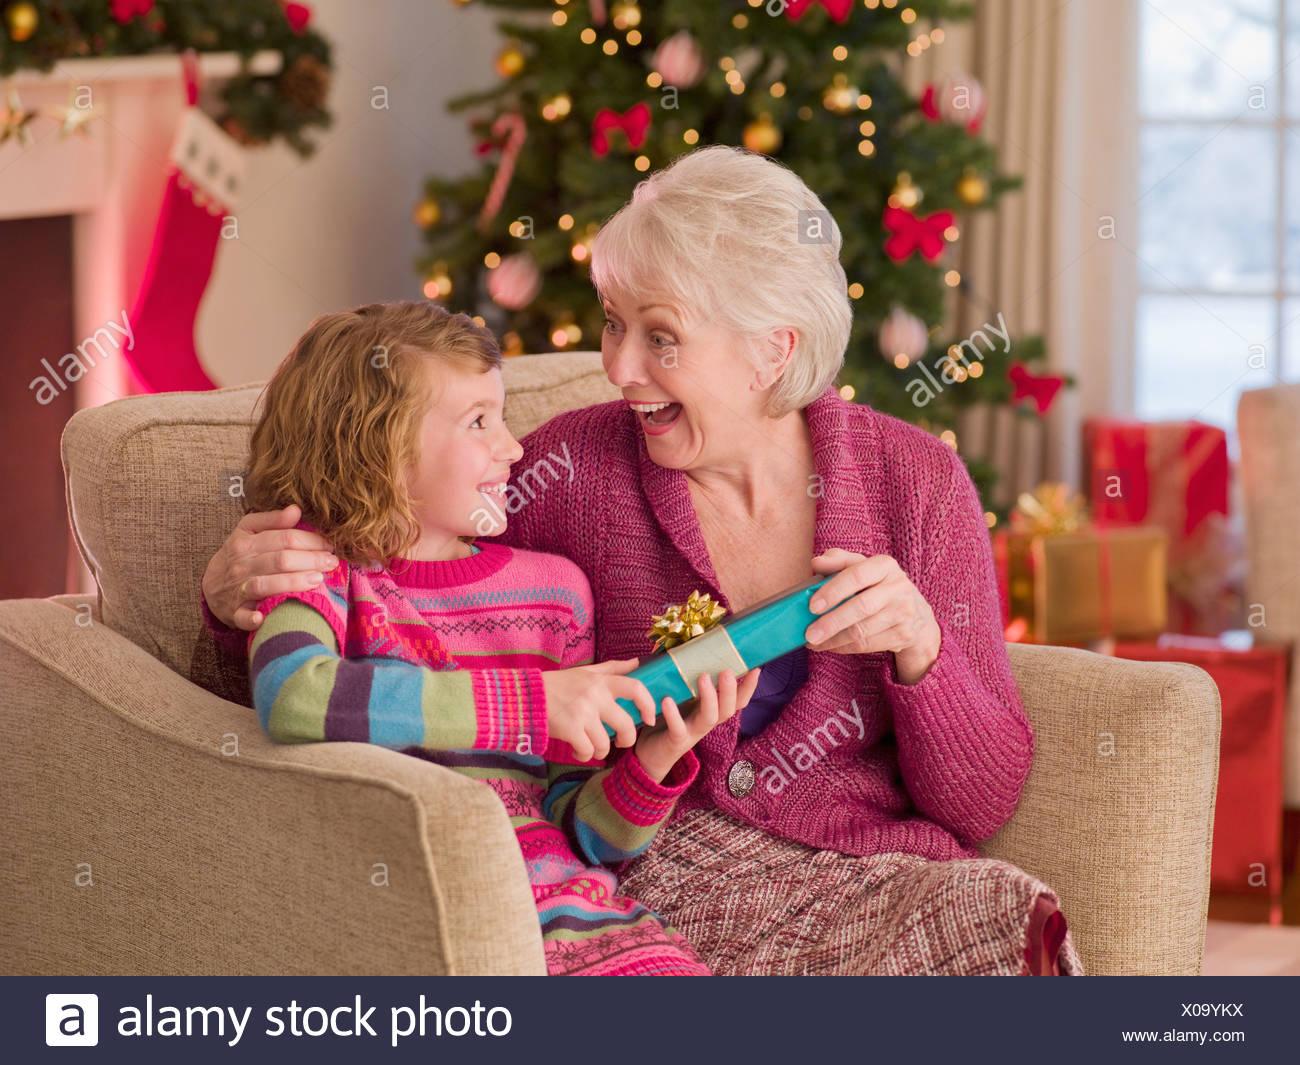 Kid Gift Grandma Stock Photos & Kid Gift Grandma Stock Images - Alamy